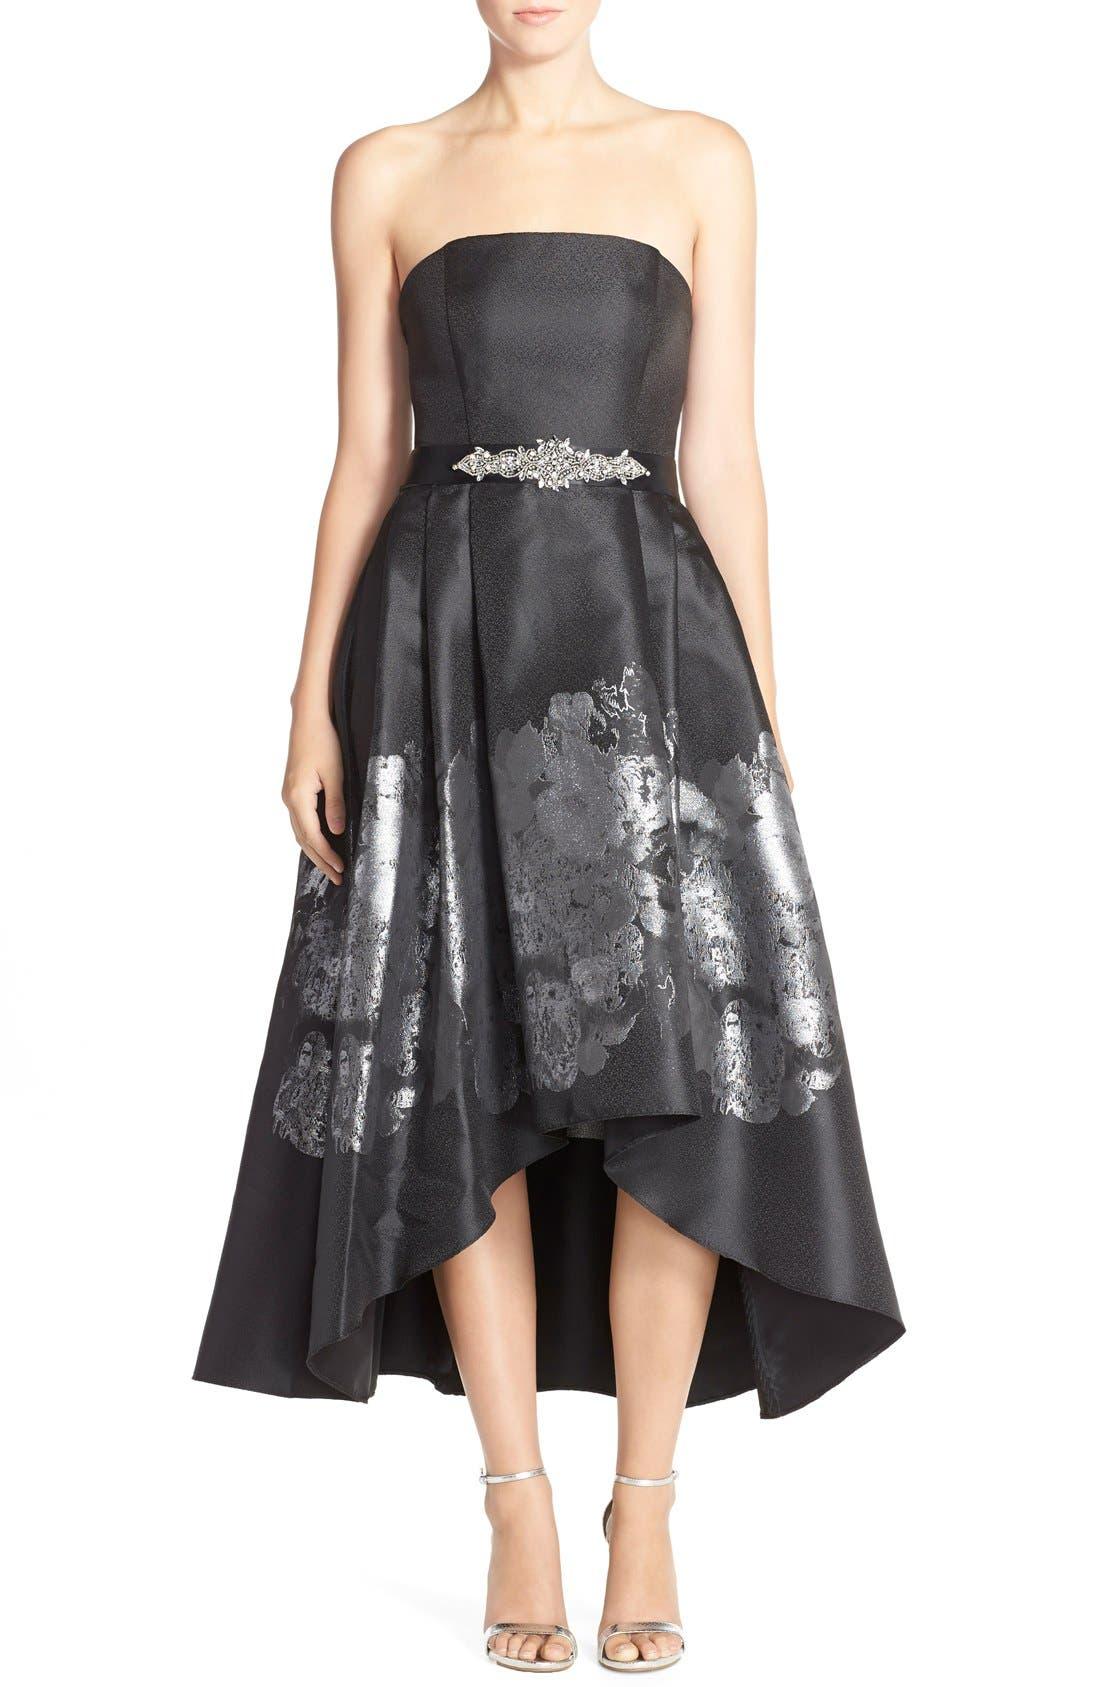 Main Image - Betsy & Adam Metallic Jacquard High/Low Fit & Flare Dress